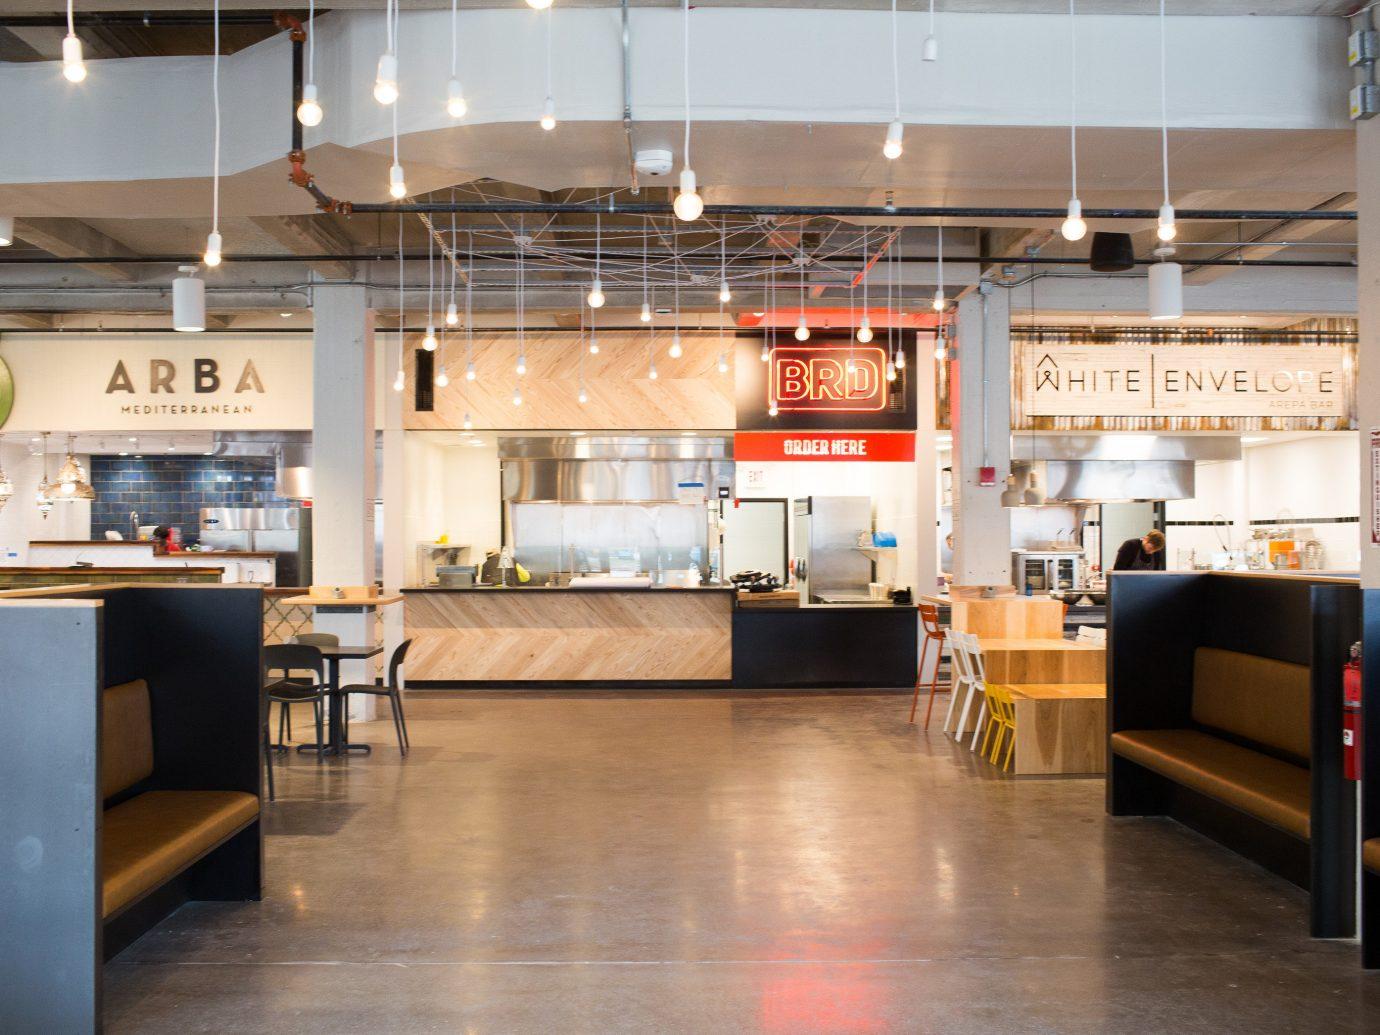 Food + Drink floor indoor interior design Lobby café loft furniture